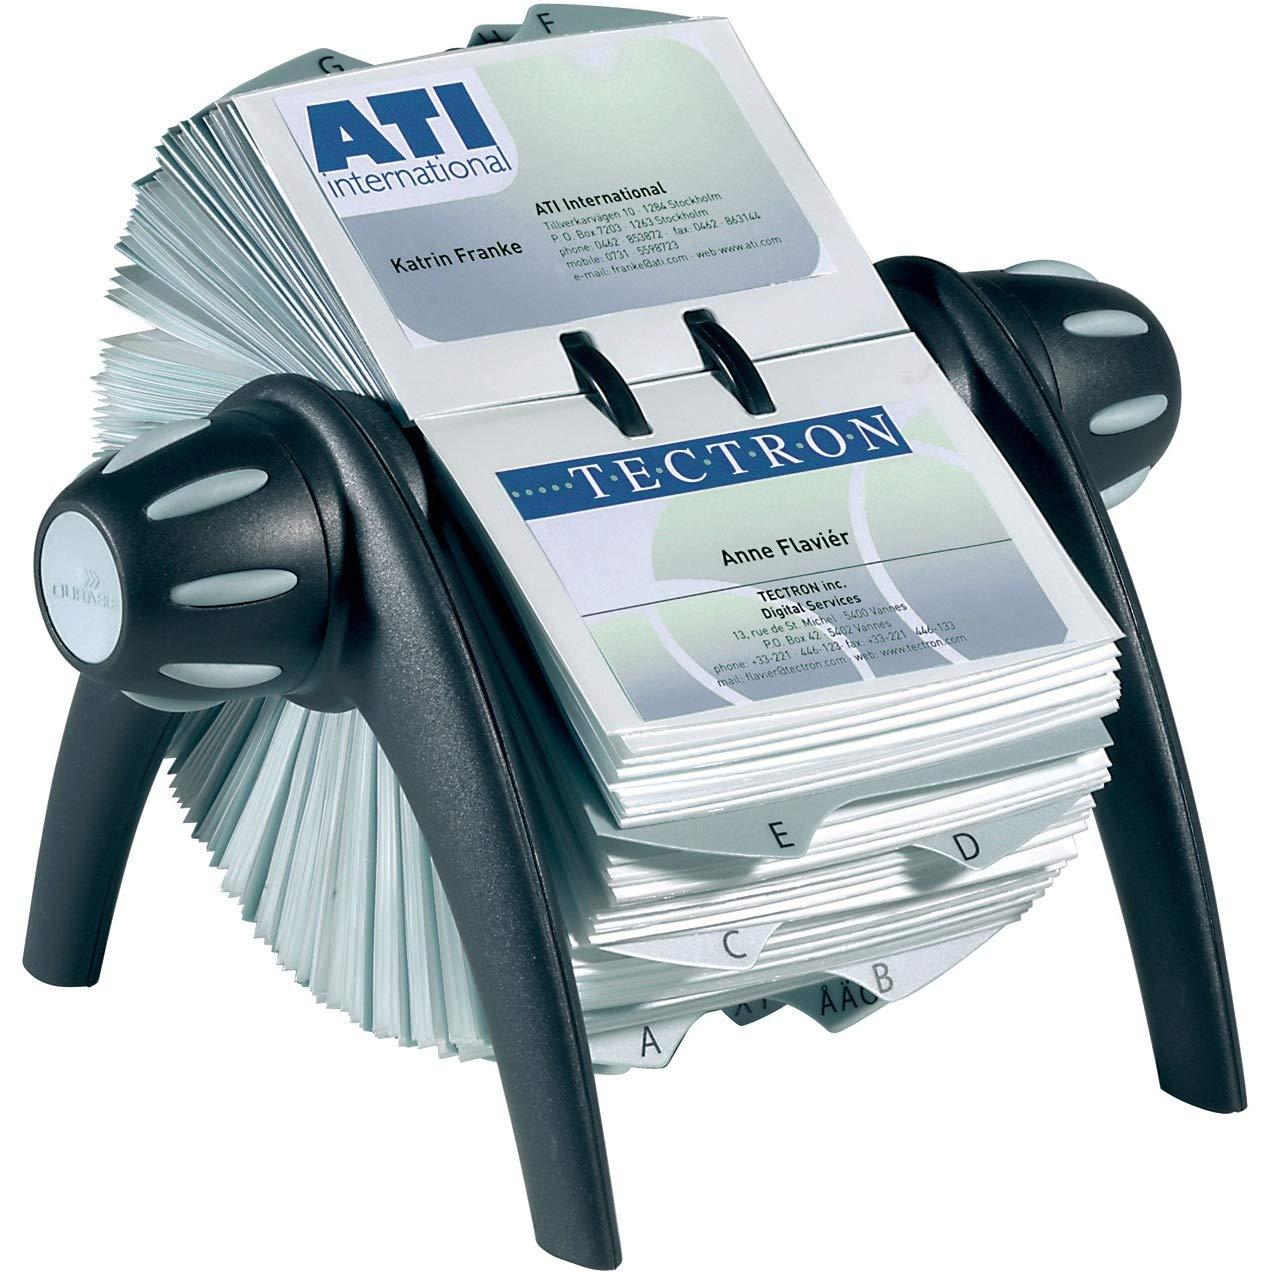 VISIFIX Business Card Files, (DBL241701) by Visifix